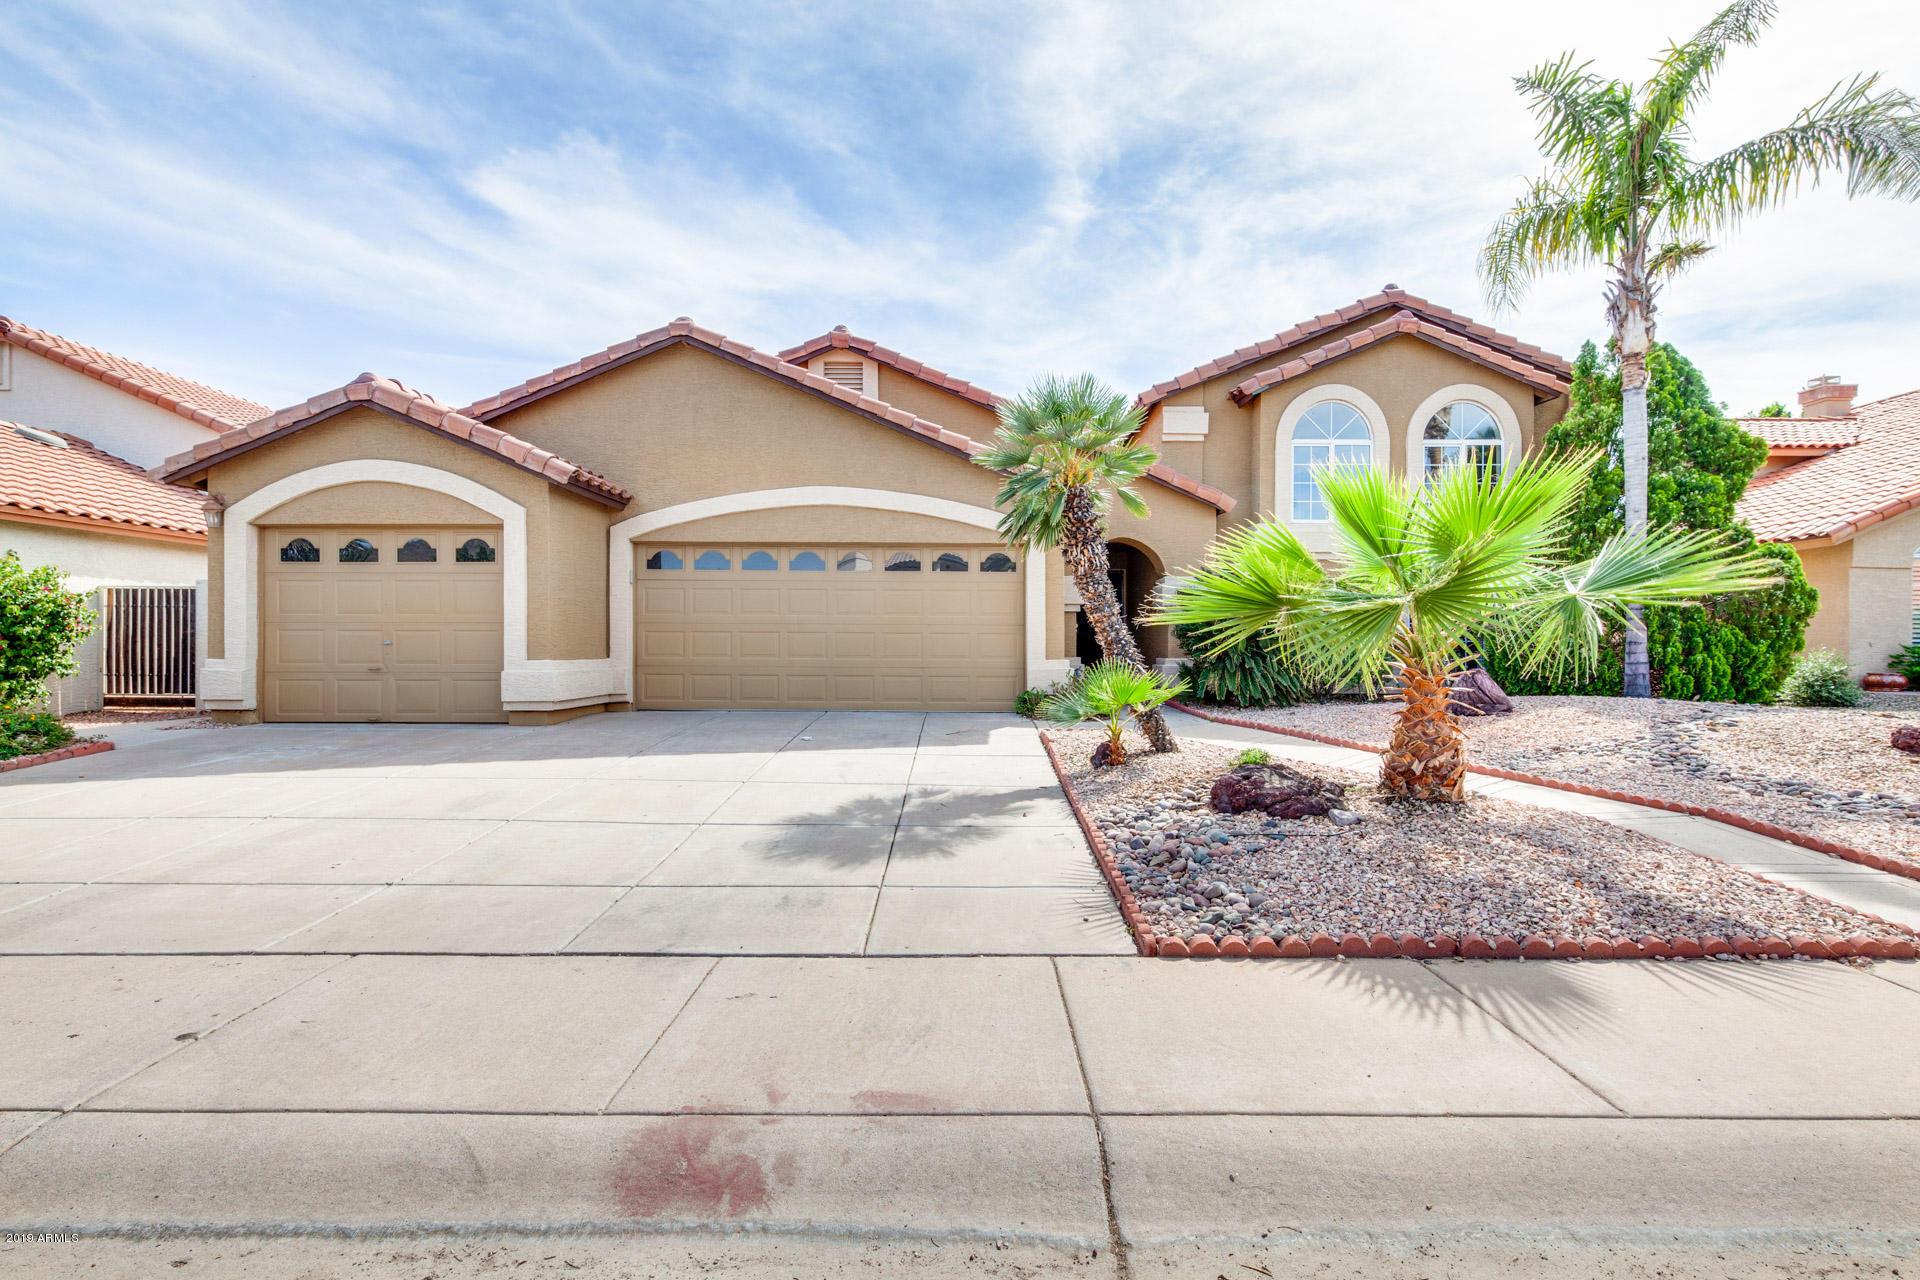 Photo of 6229 W LONE CACTUS Drive, Glendale, AZ 85308